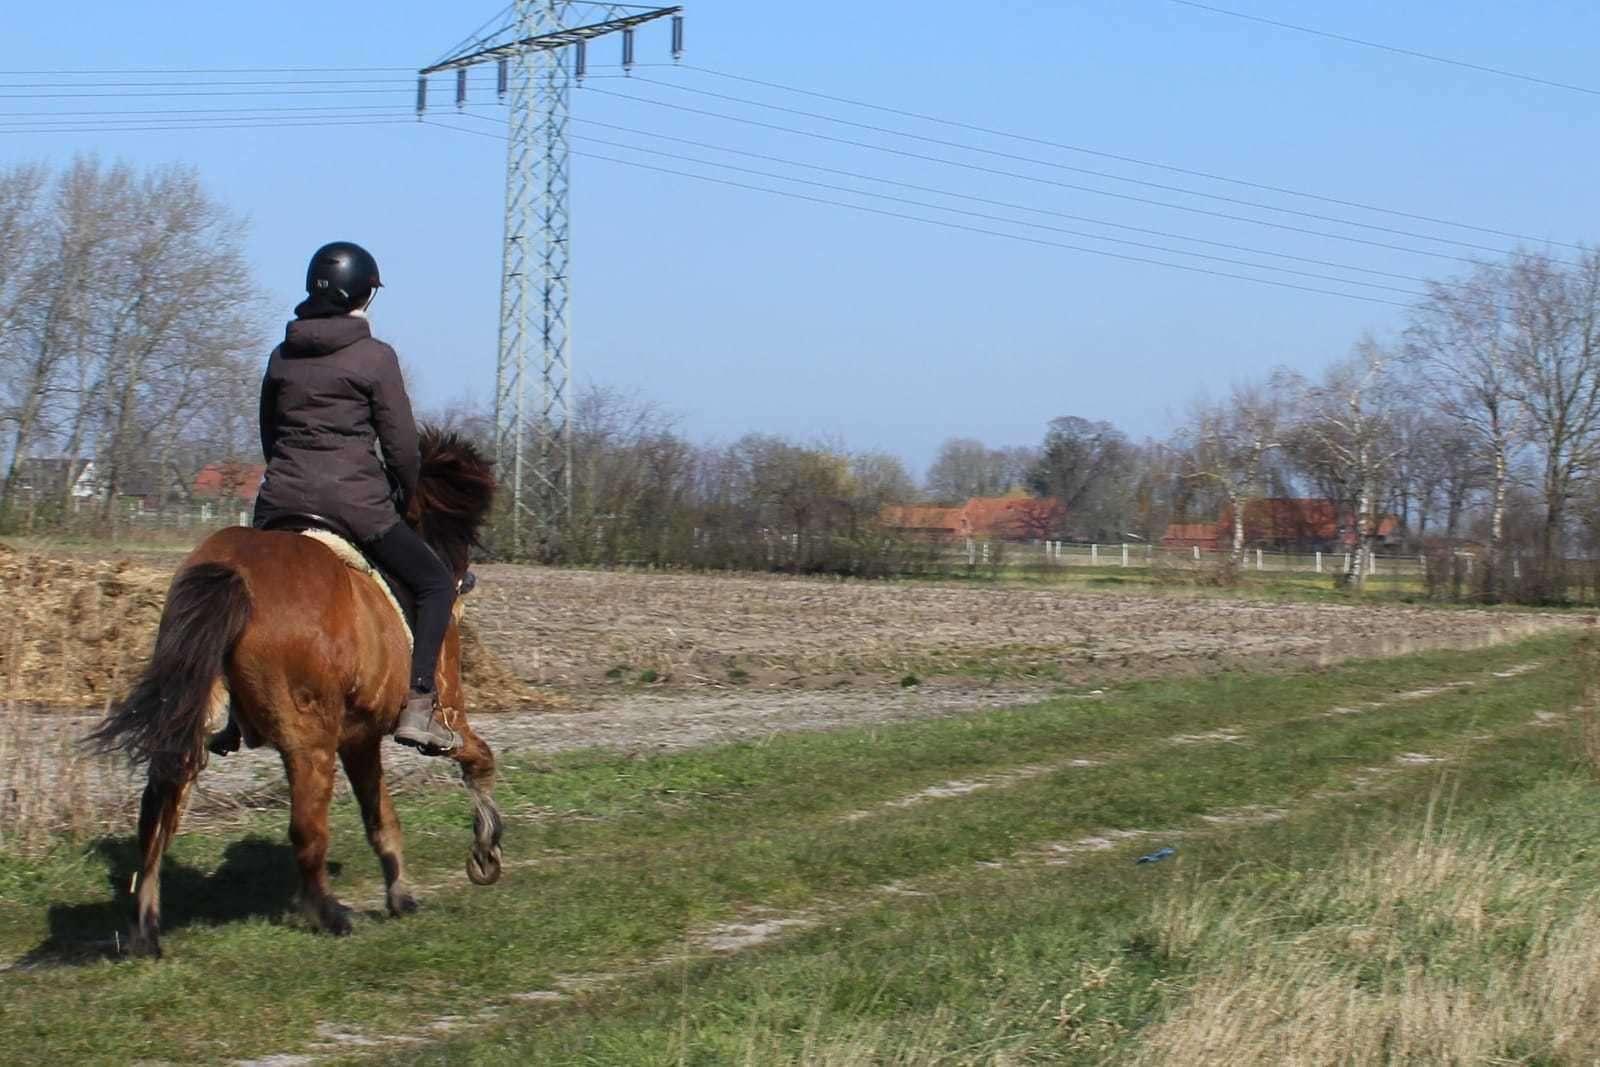 Auch in Corona-Zeiten sollten die Pferde bewegt werden. Foto: Manon Blaak